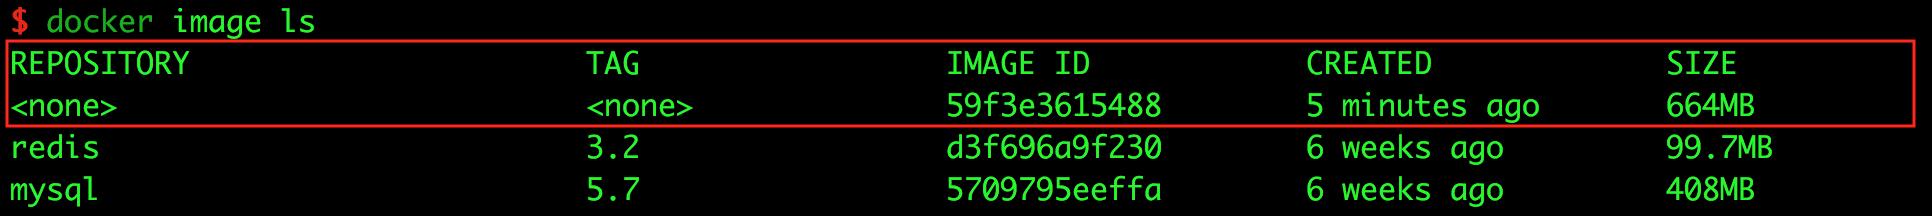 docker-image-ls